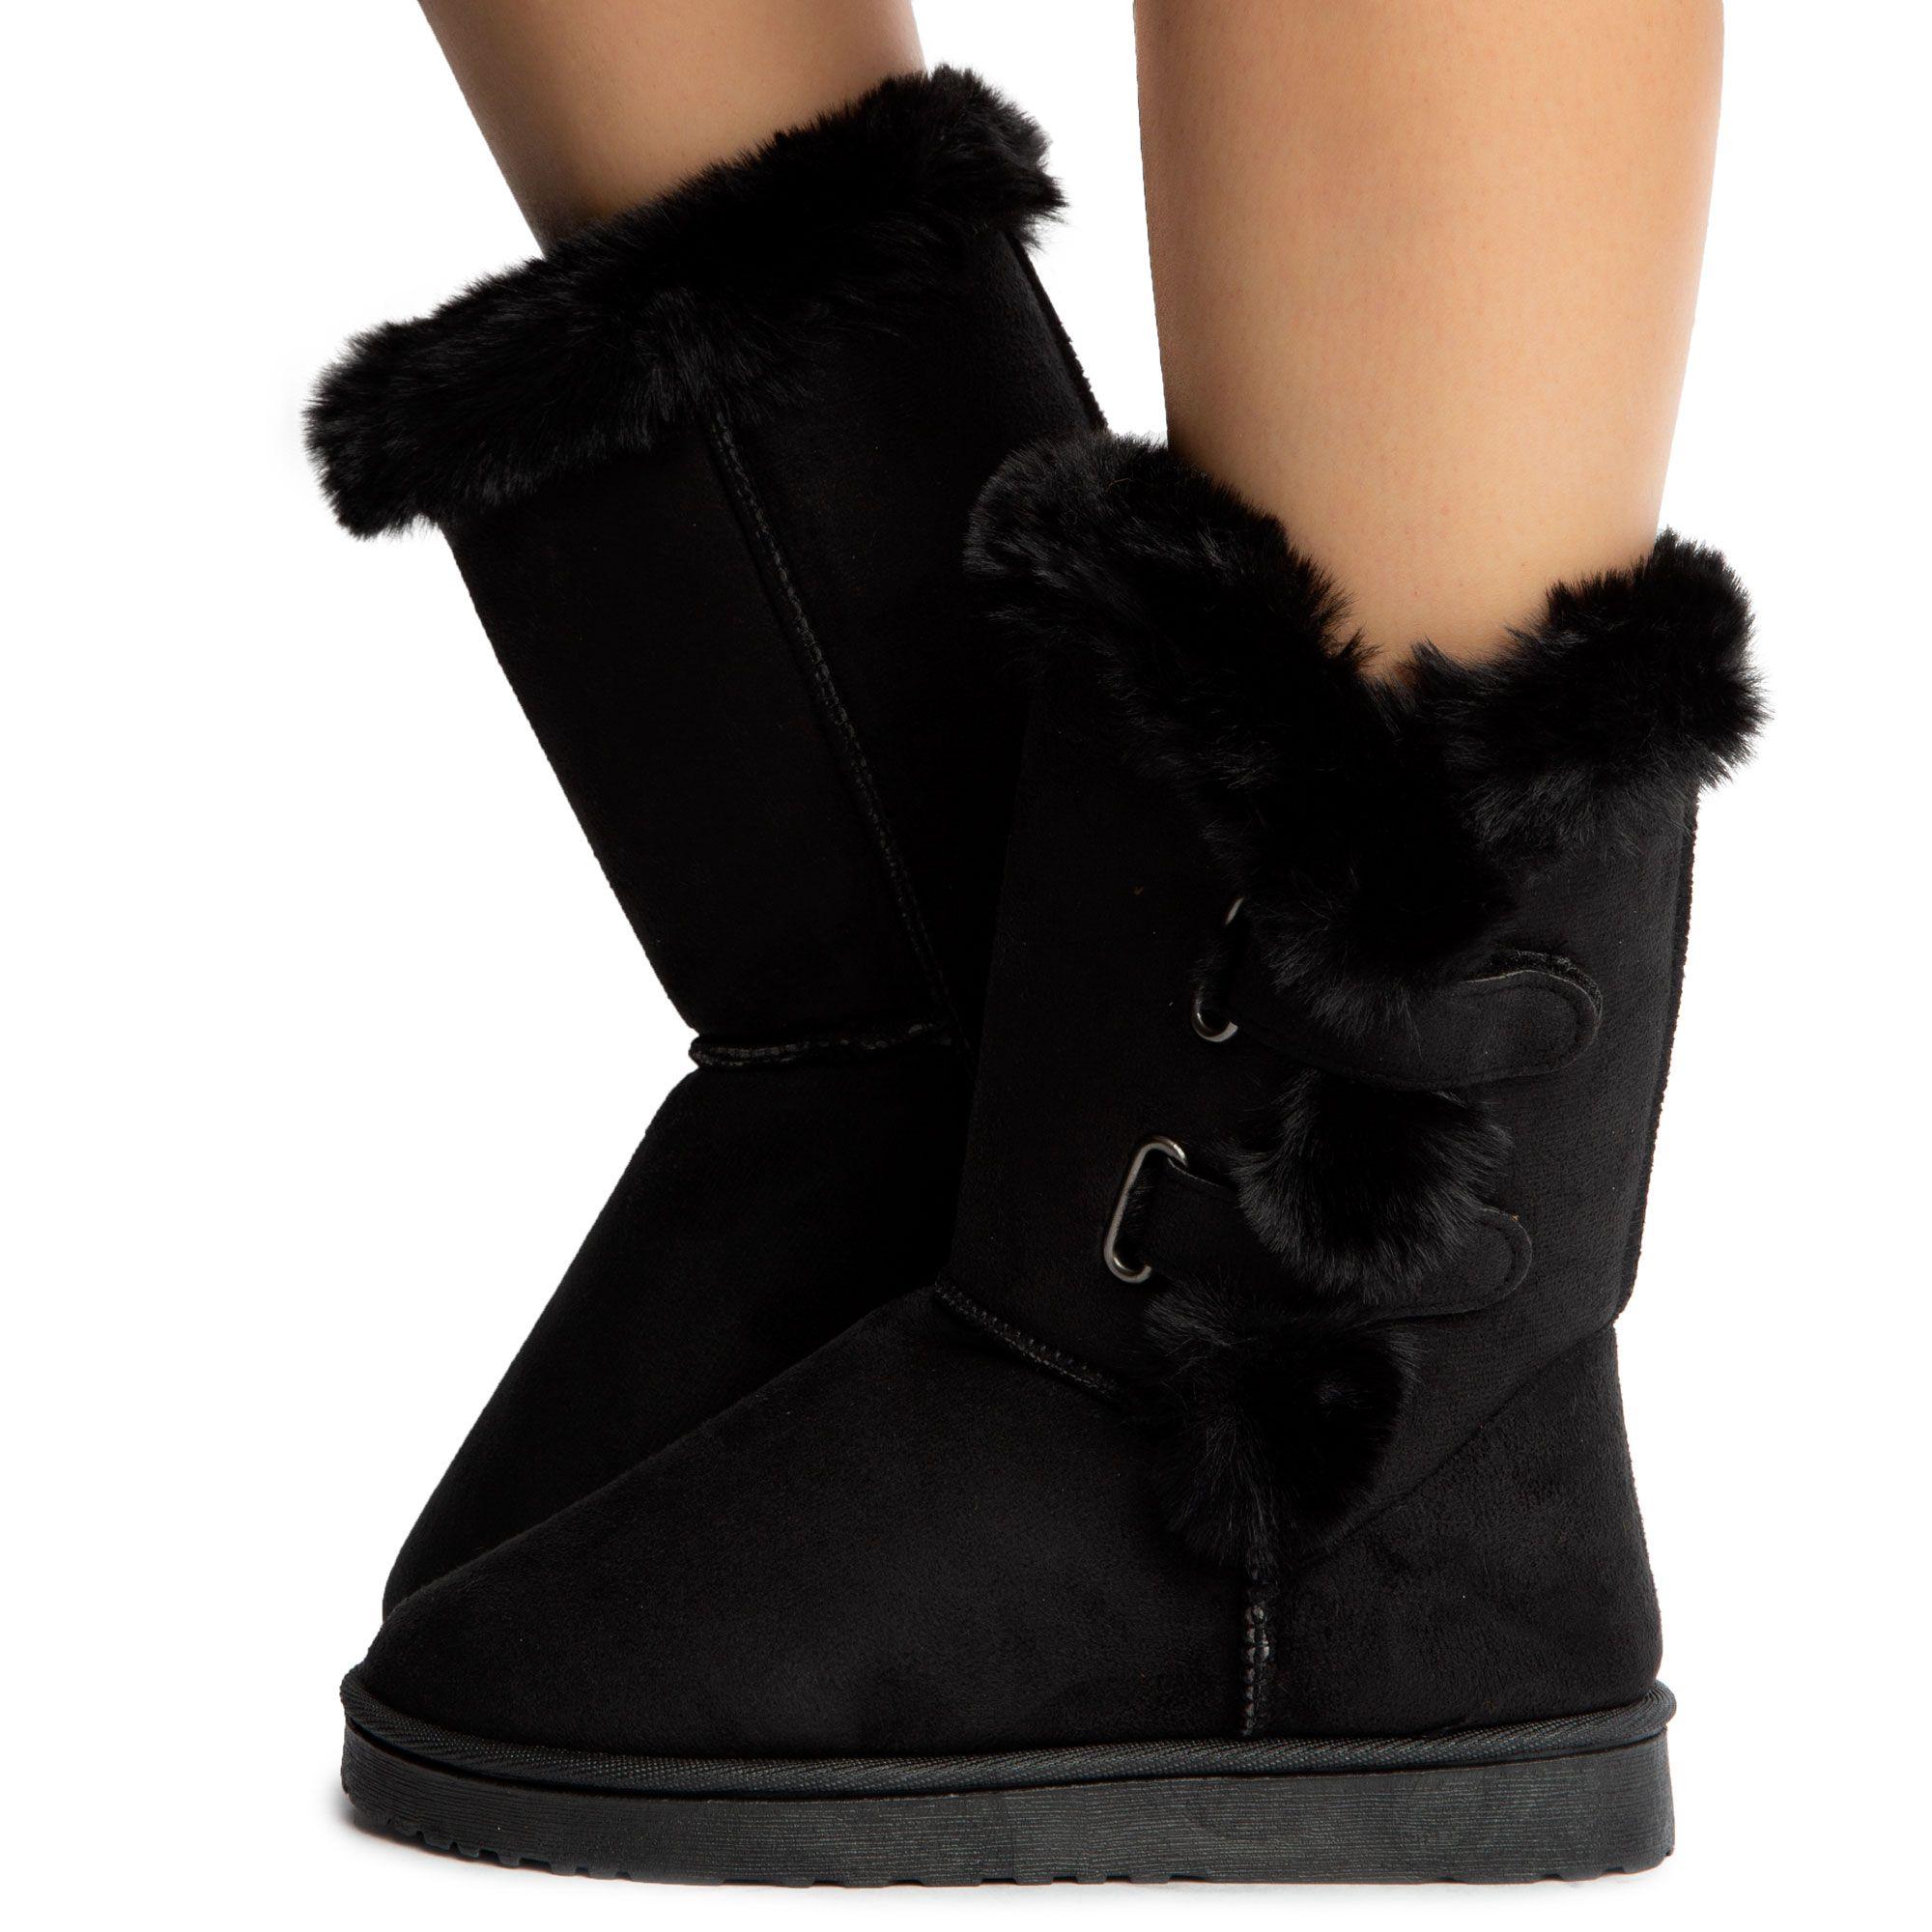 Desire-R001 Mid-Calf Fur Boots